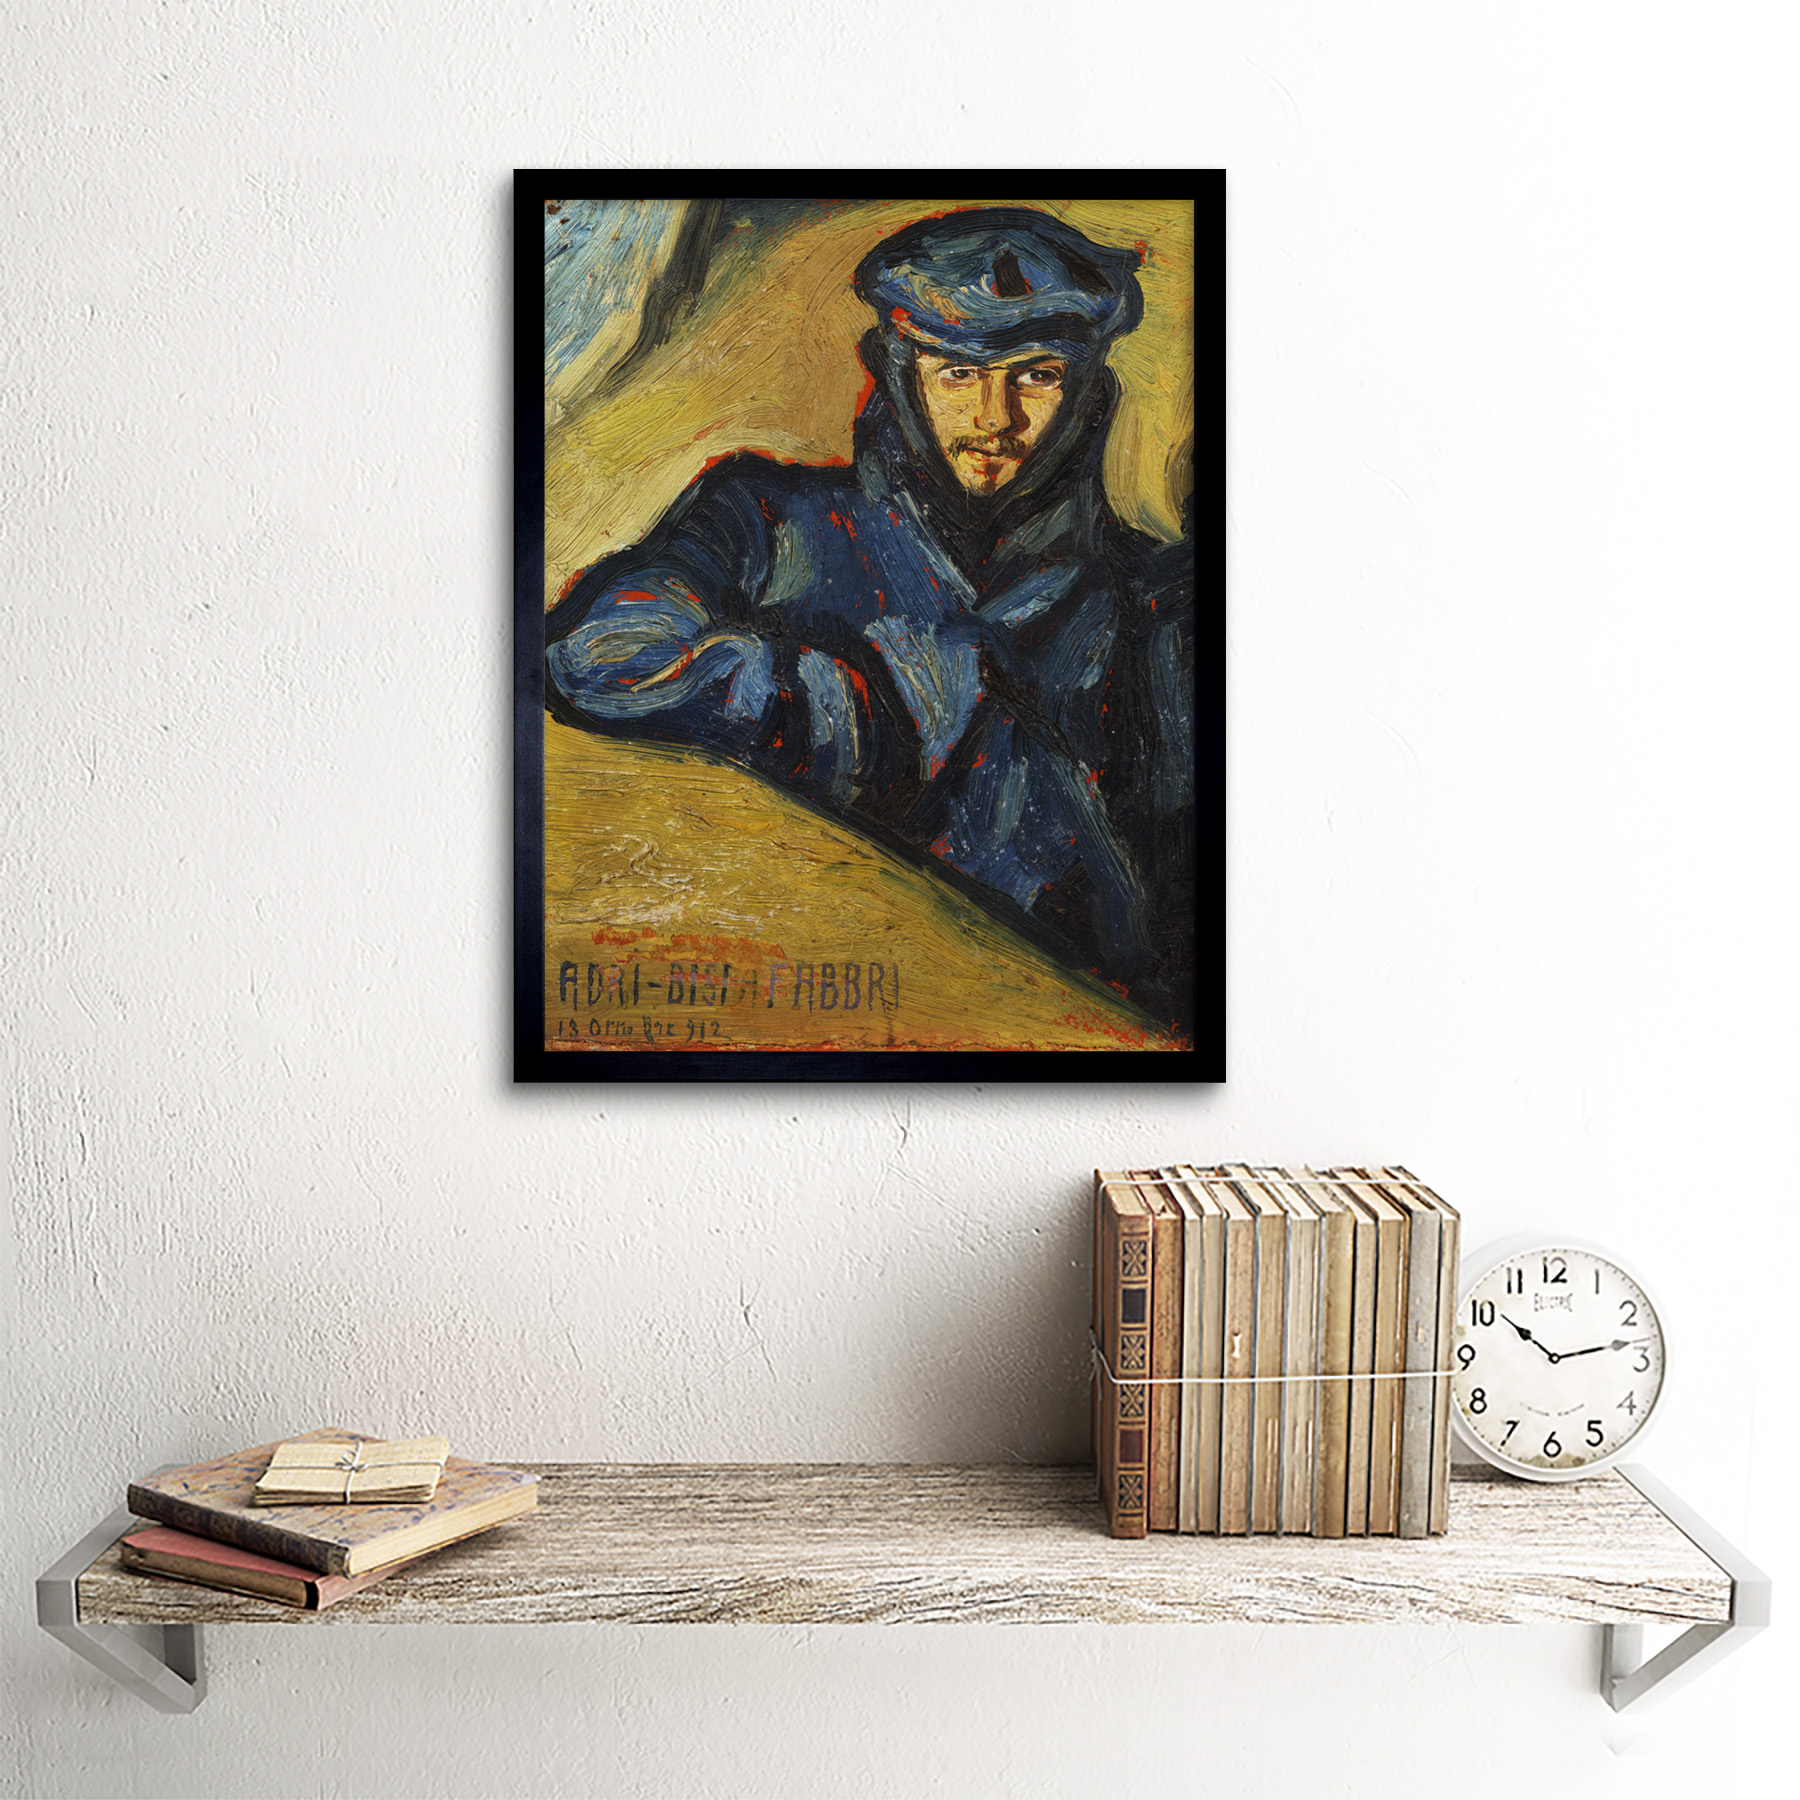 Bisi-Fabbri-Aviator-Pilot-Ricordo-Chavez-Painting-Framed-Wall-Art-Poster thumbnail 3